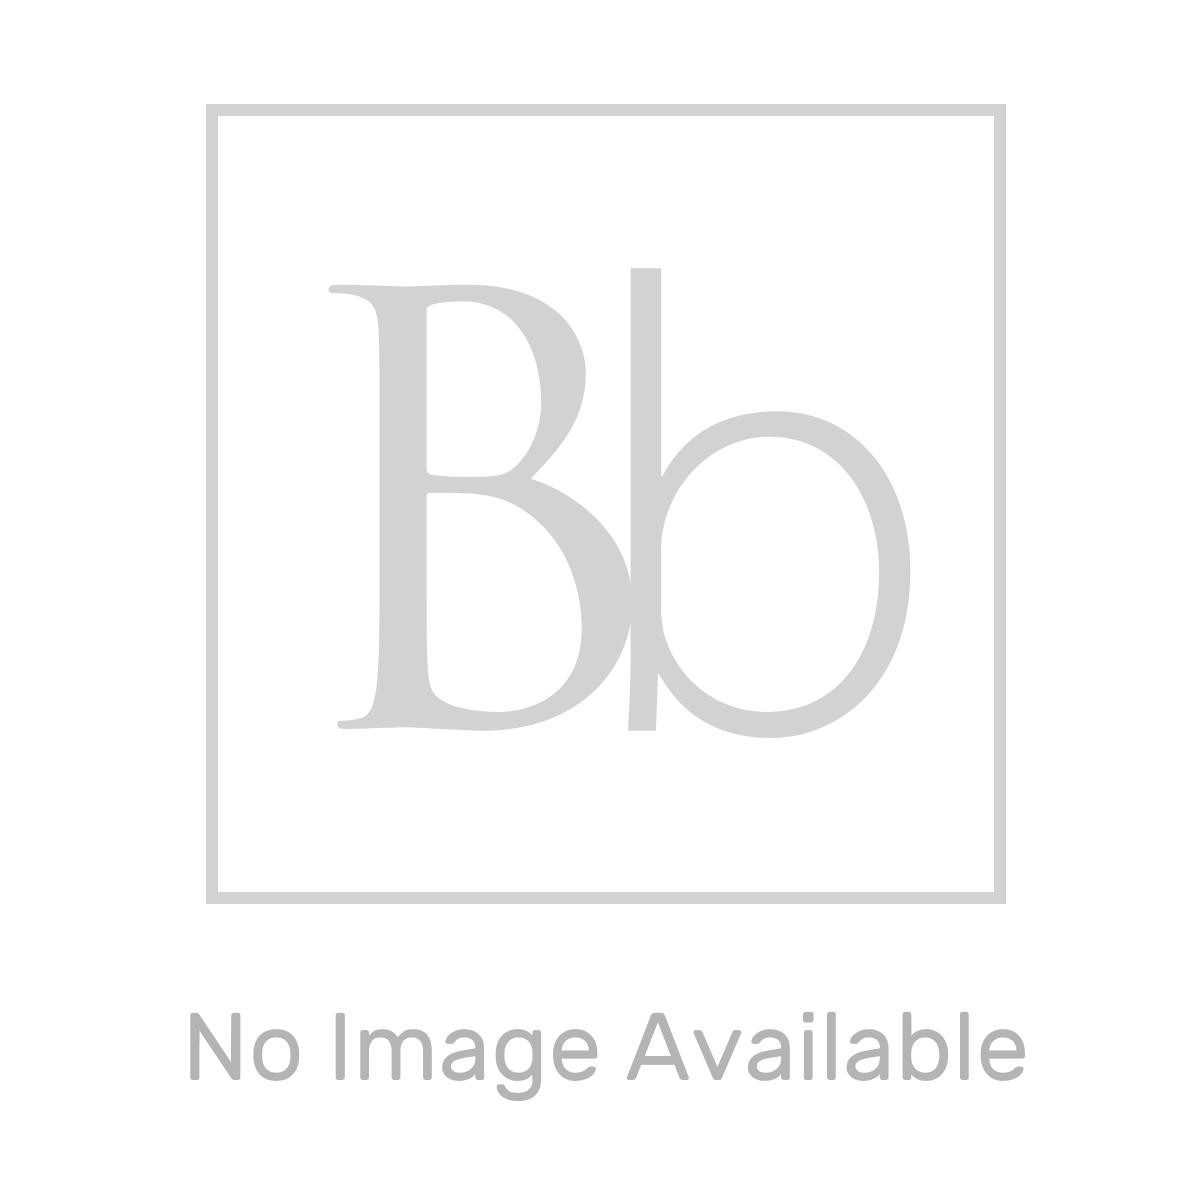 Burlington Classic Grey LED Bathroom Mirror 1200mm Dimensions